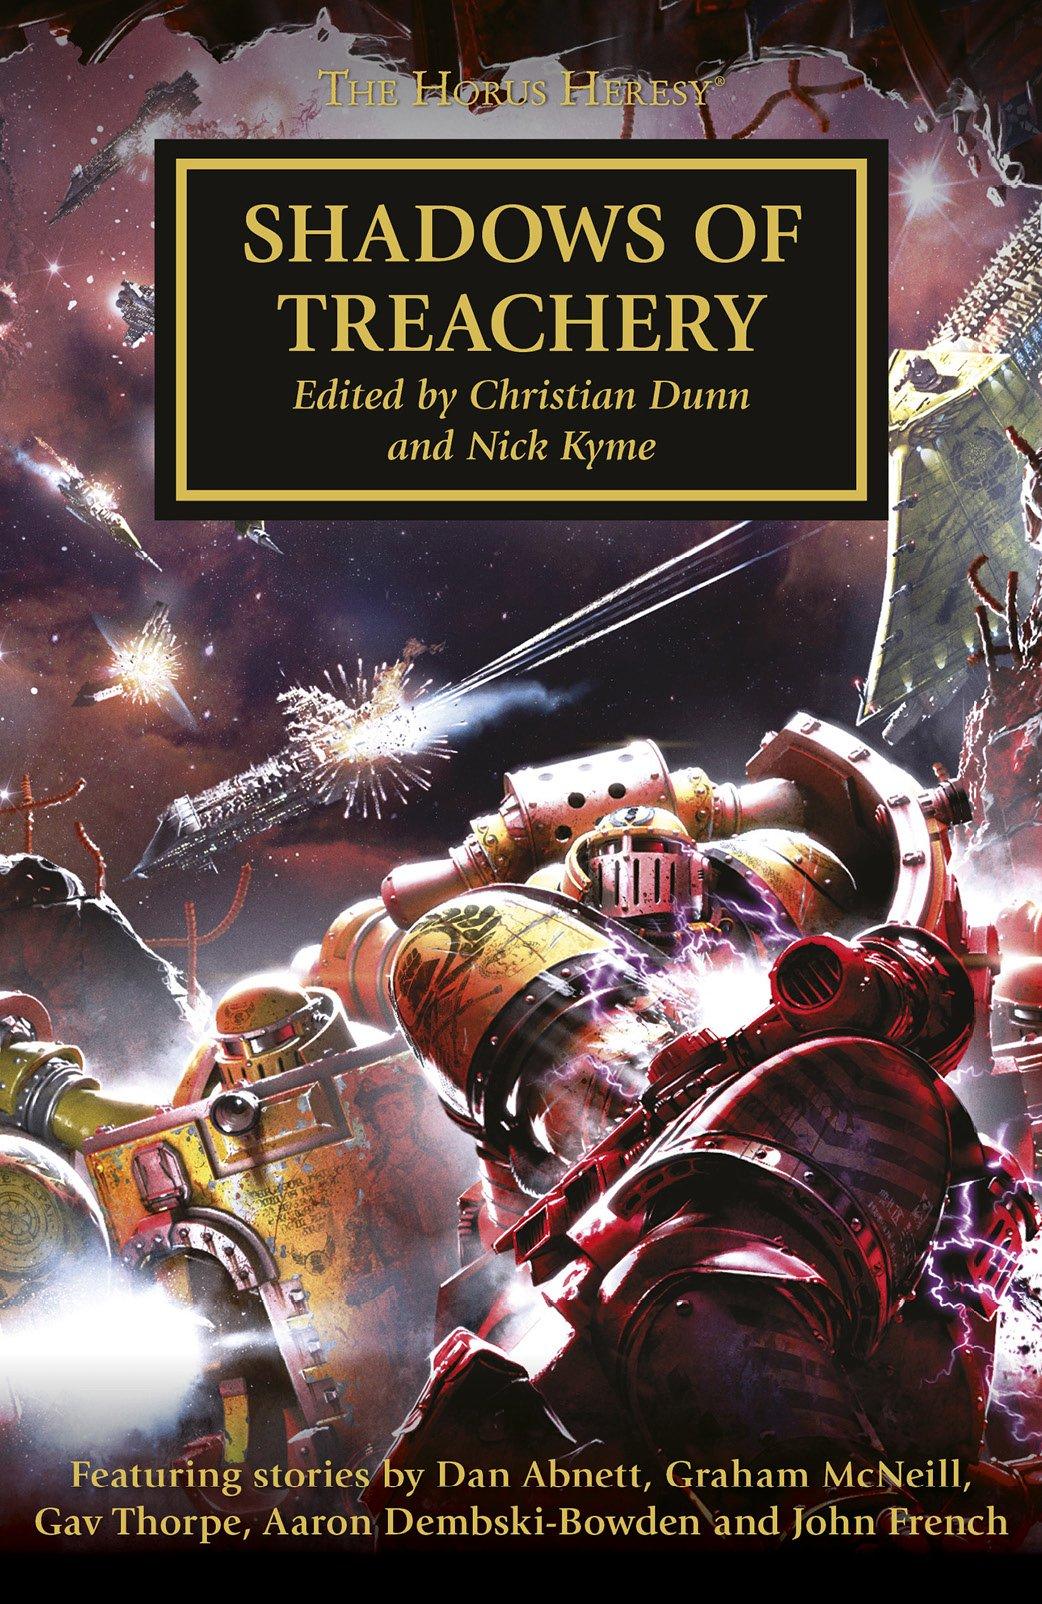 Shadows of Treachery by Nick Kyme, C.Z. Dunn